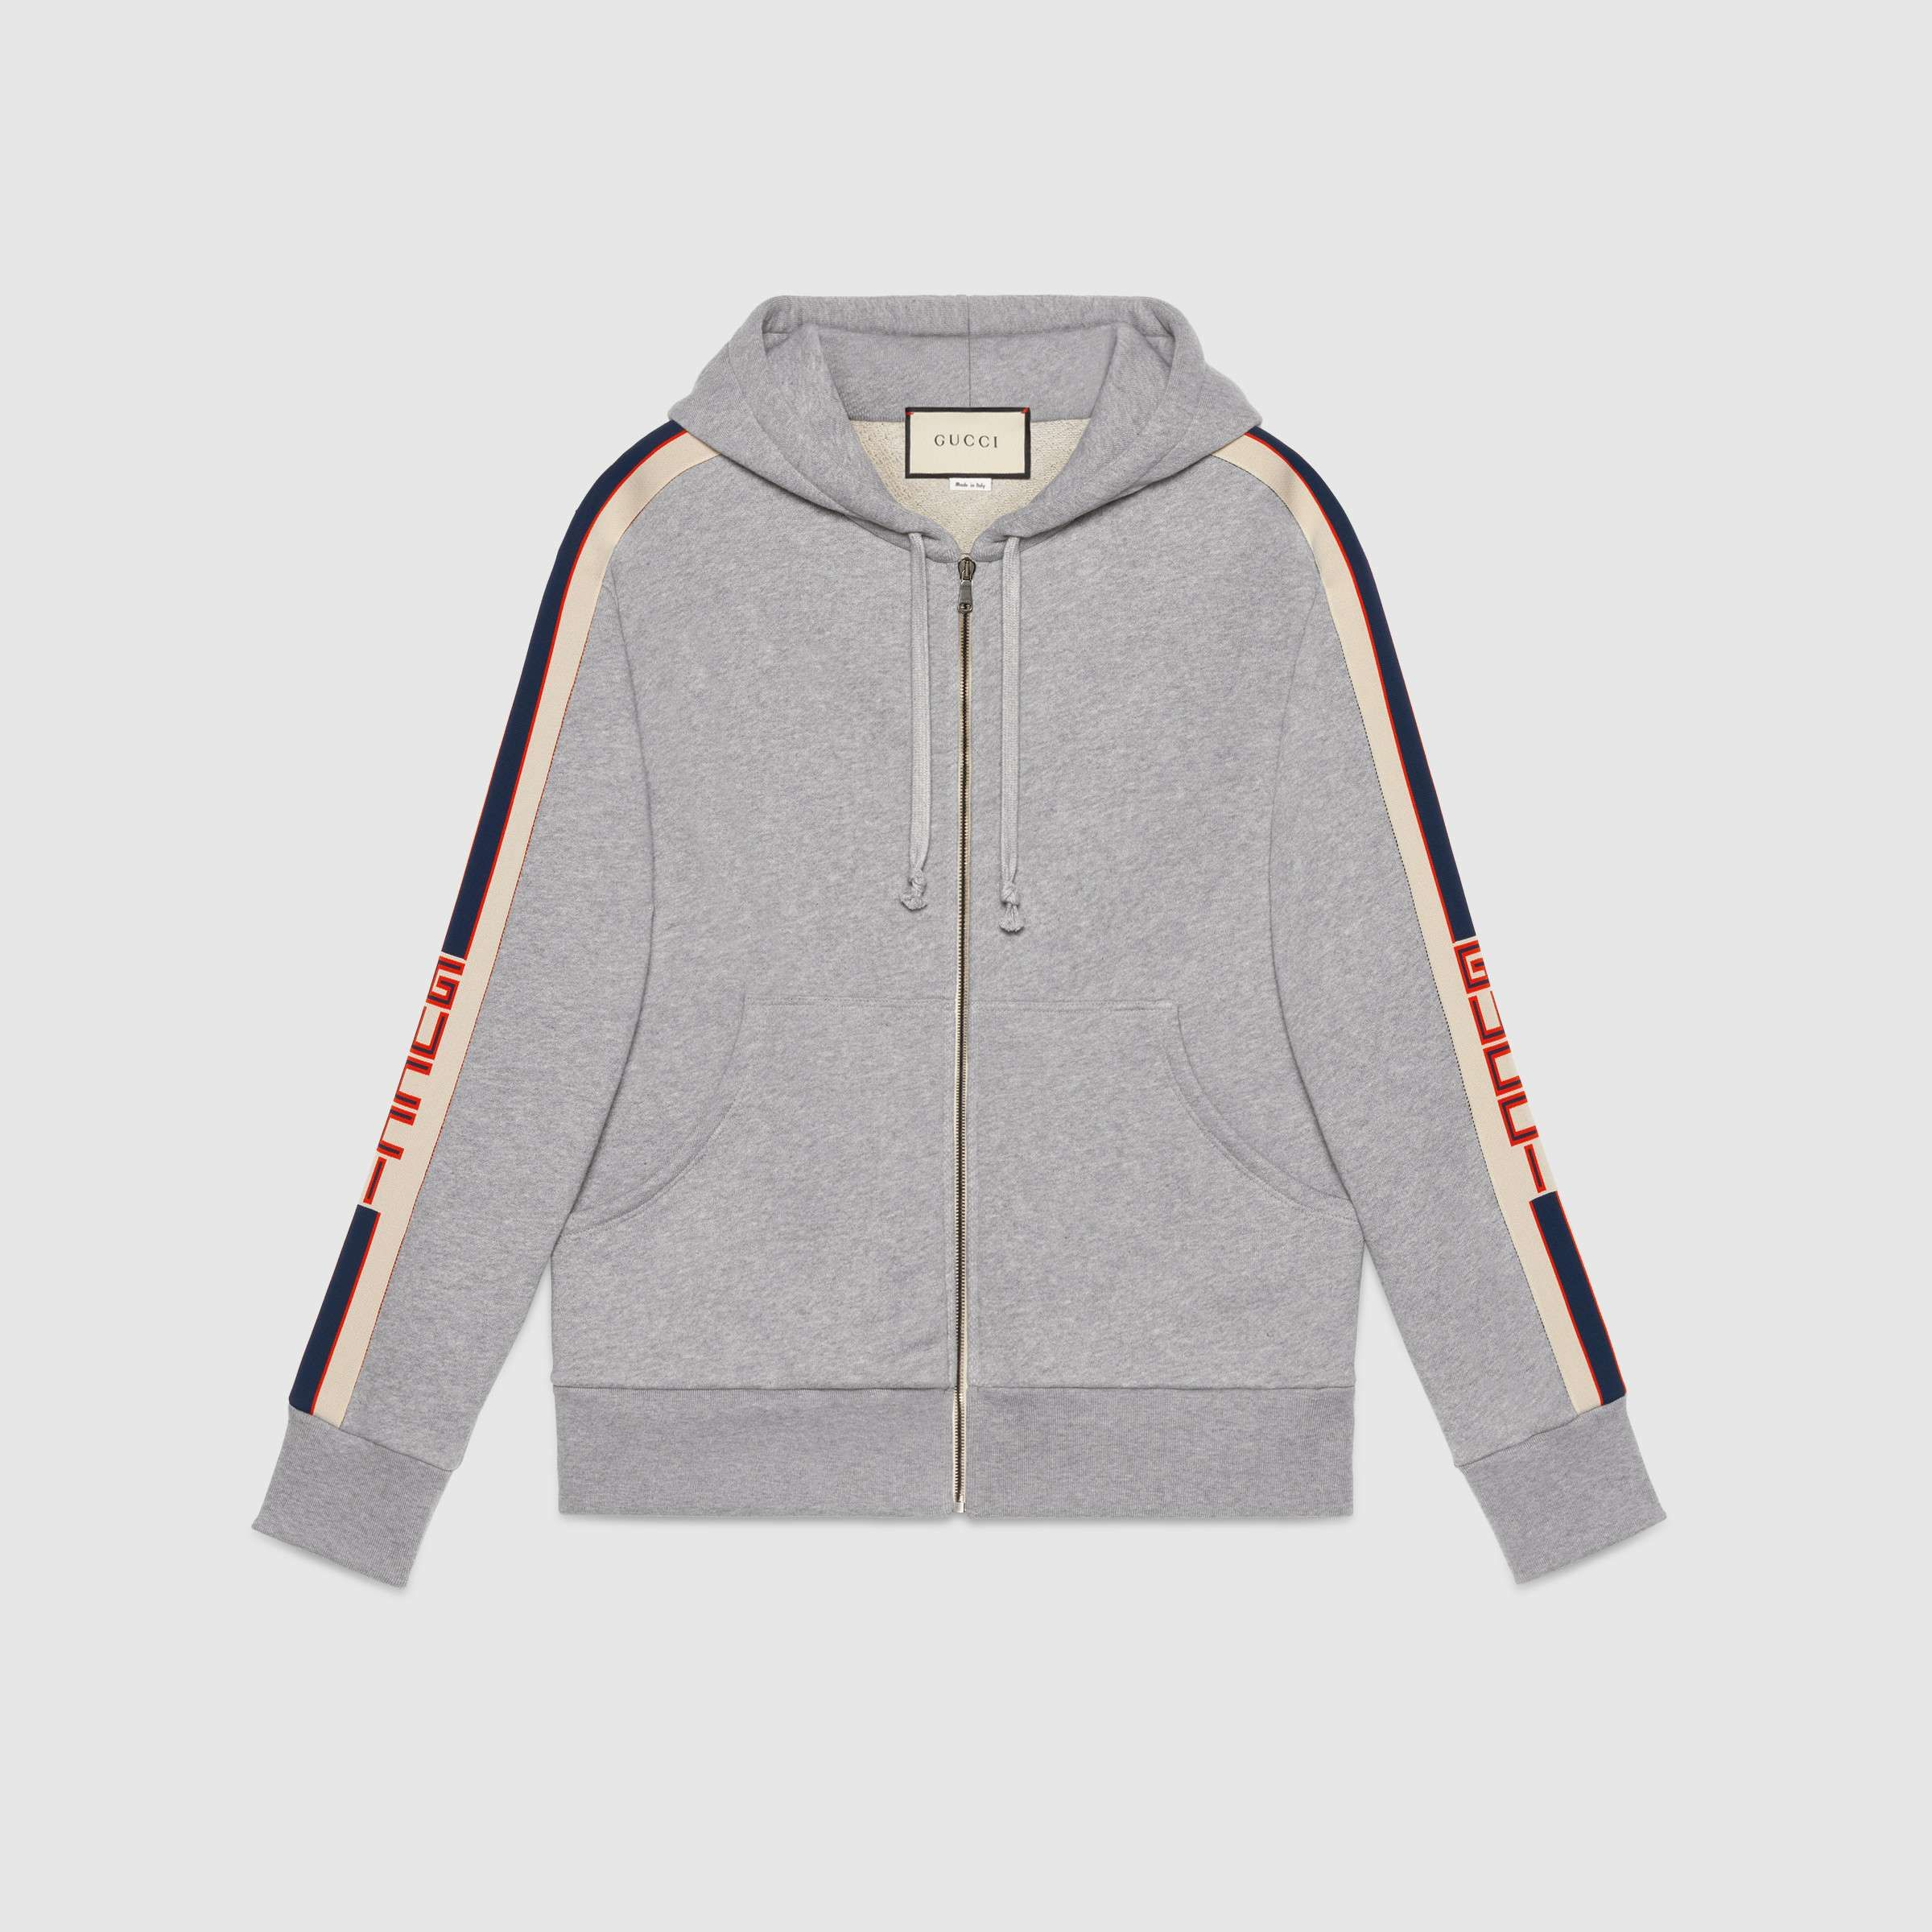 new appearance top design timeless design Replica GUCCI Technical jersey sweatshirt For Men 2017 Size M-XXXL ...